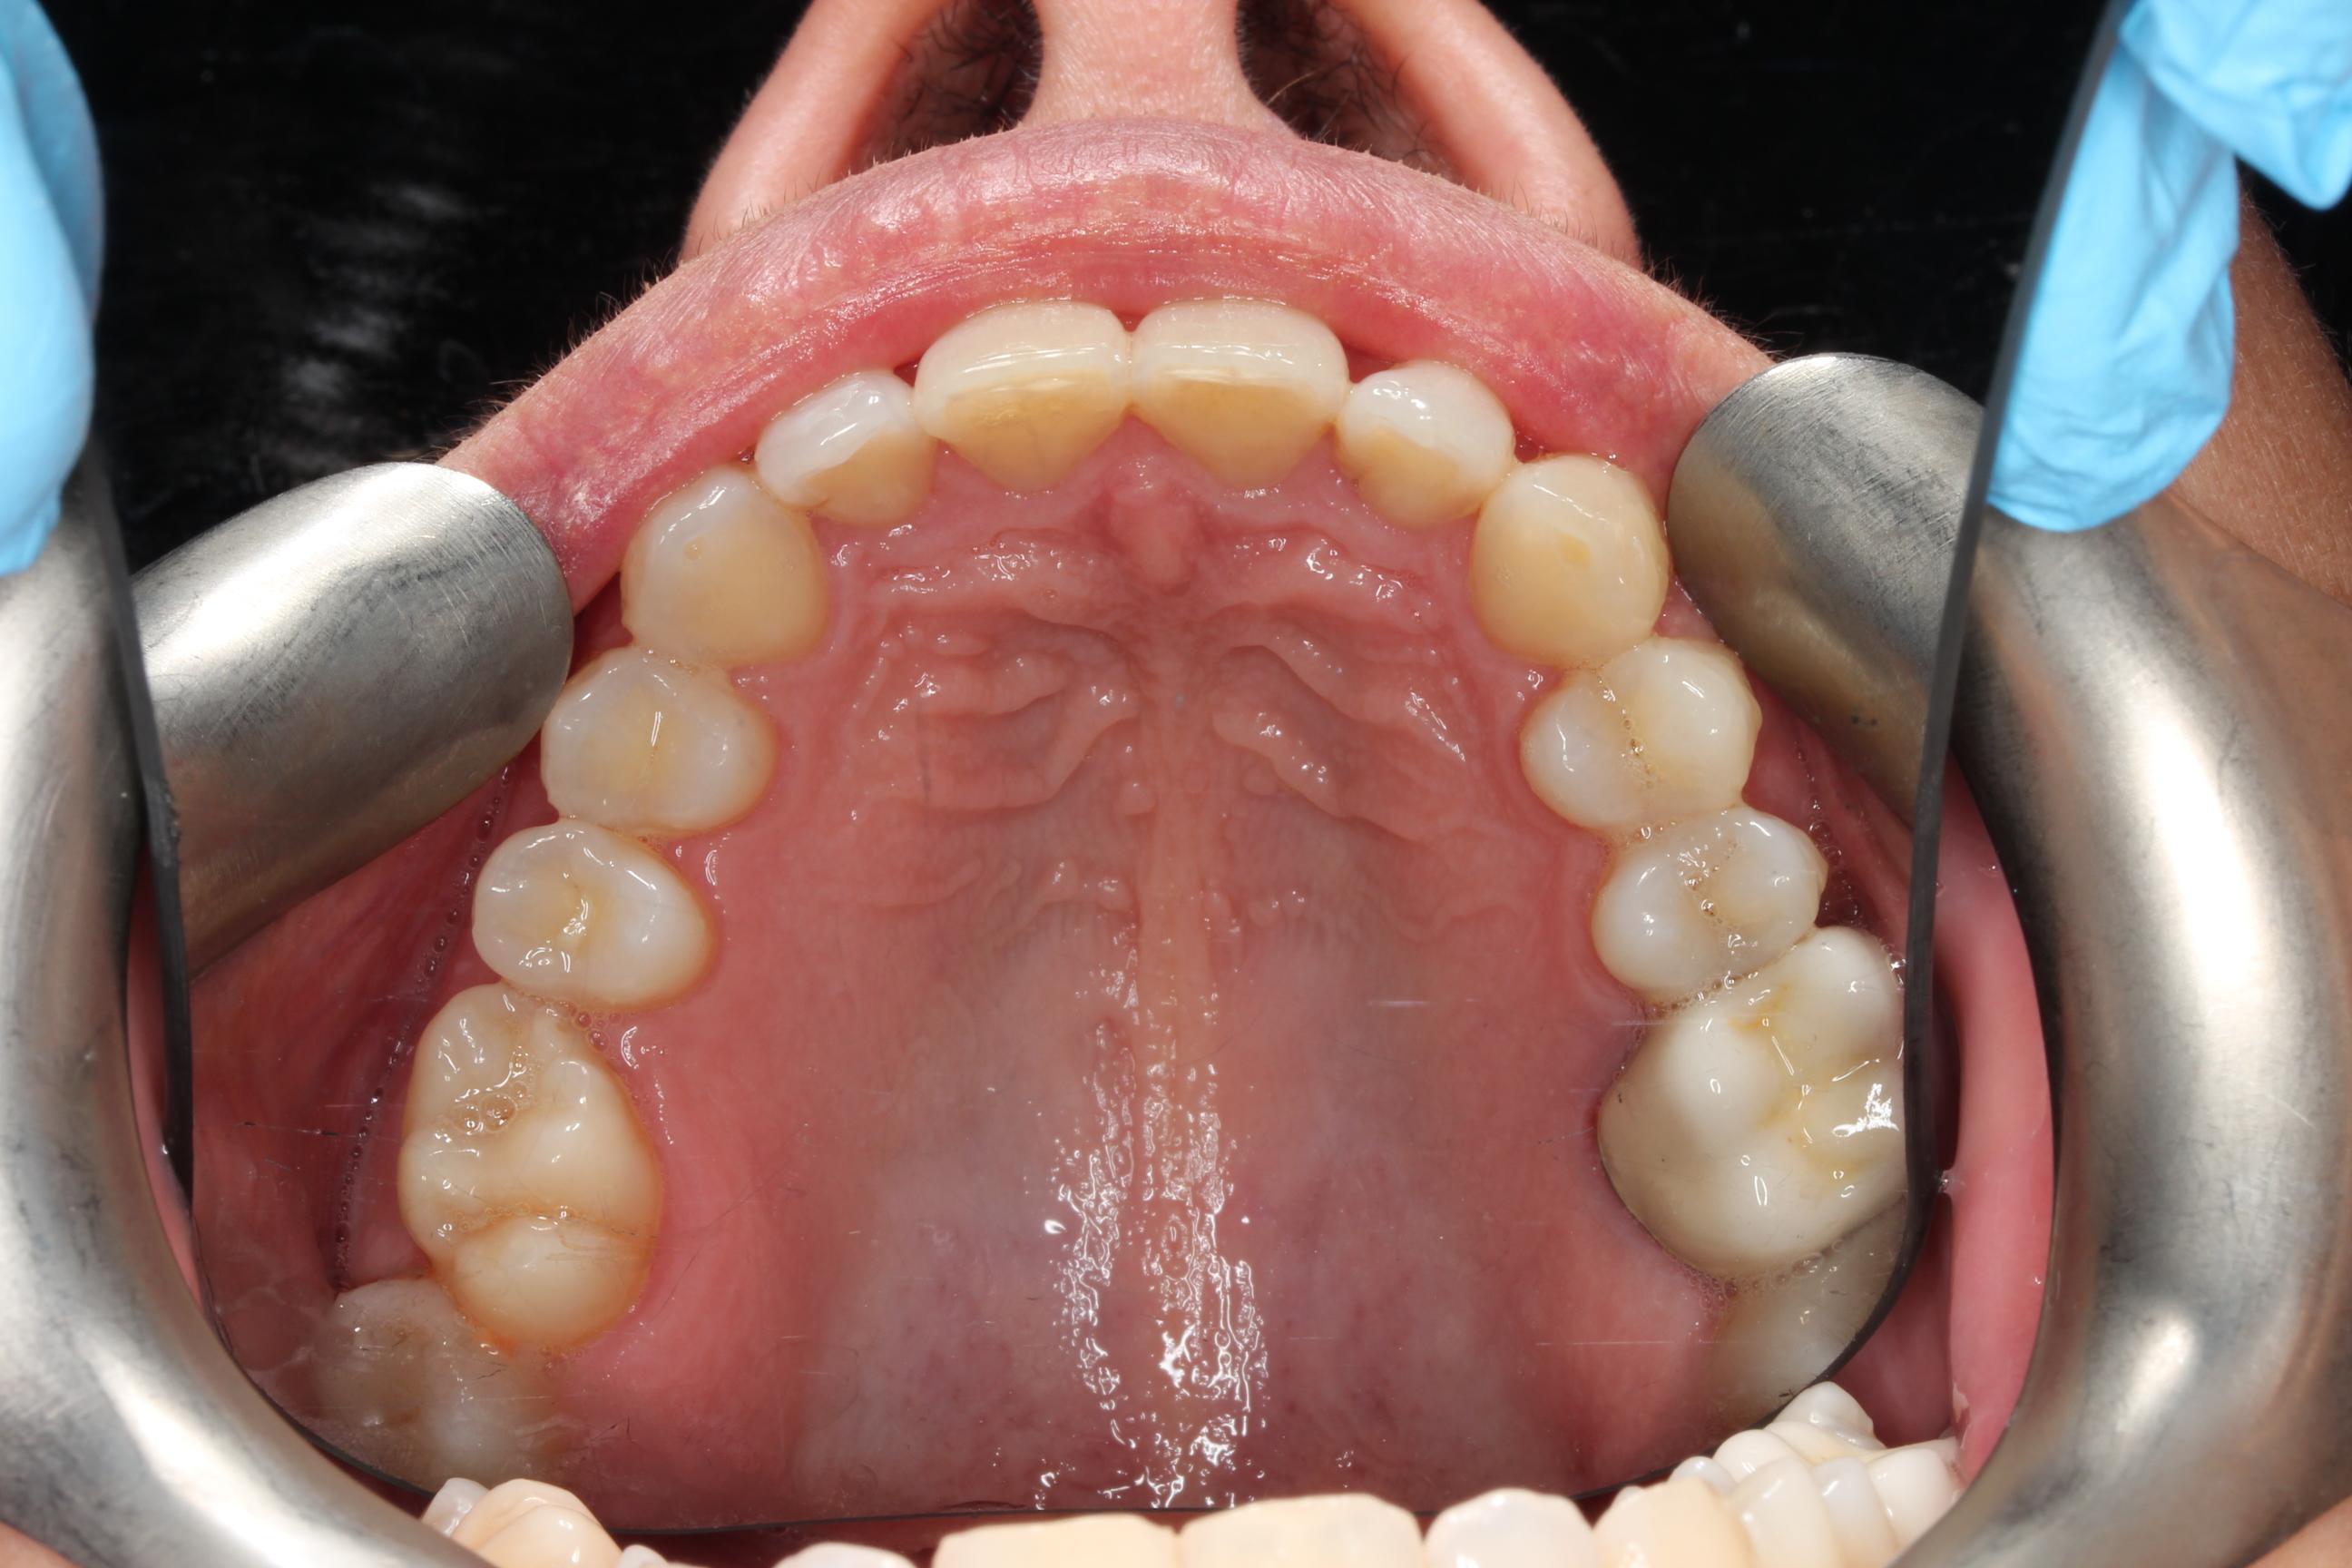 Invisalign Gallery 13 Invisalign Dentist Amp Invisalign